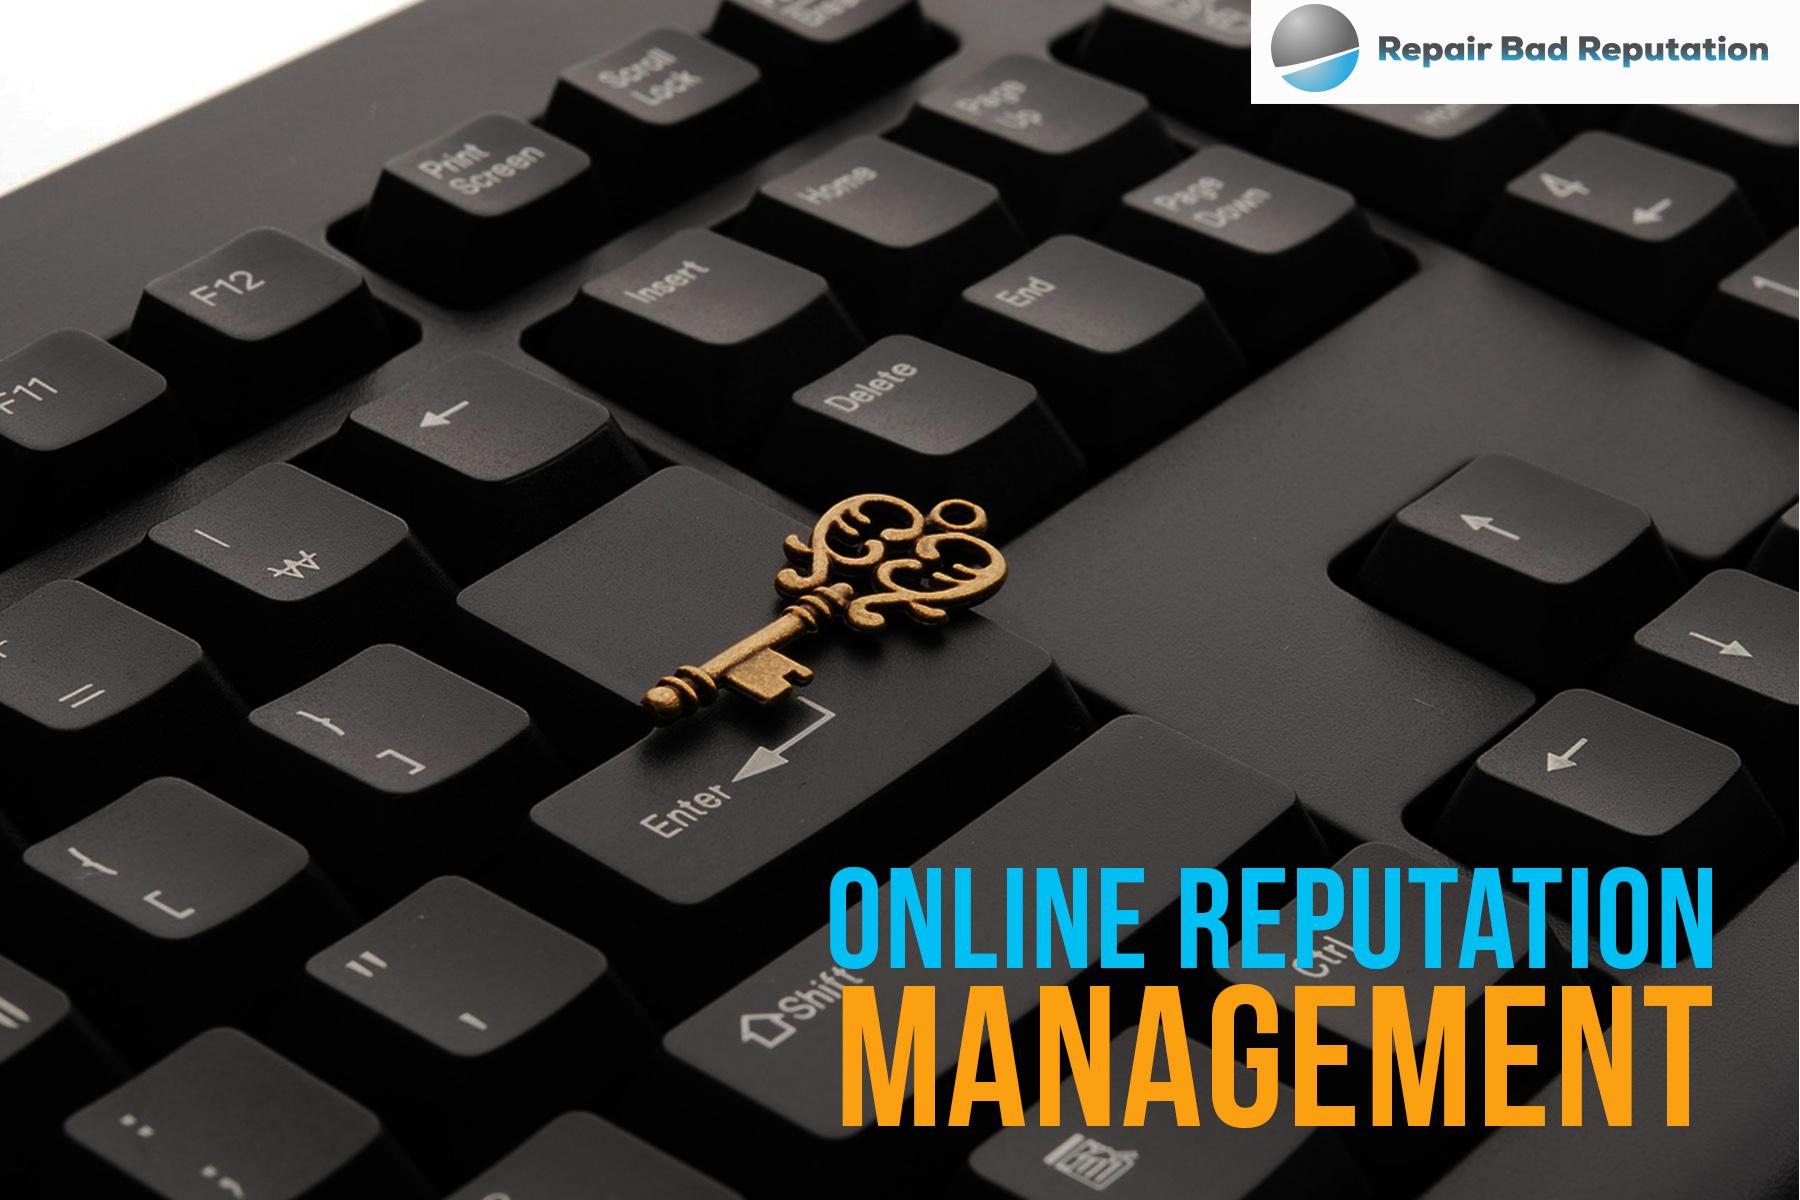 Dating online reputation management